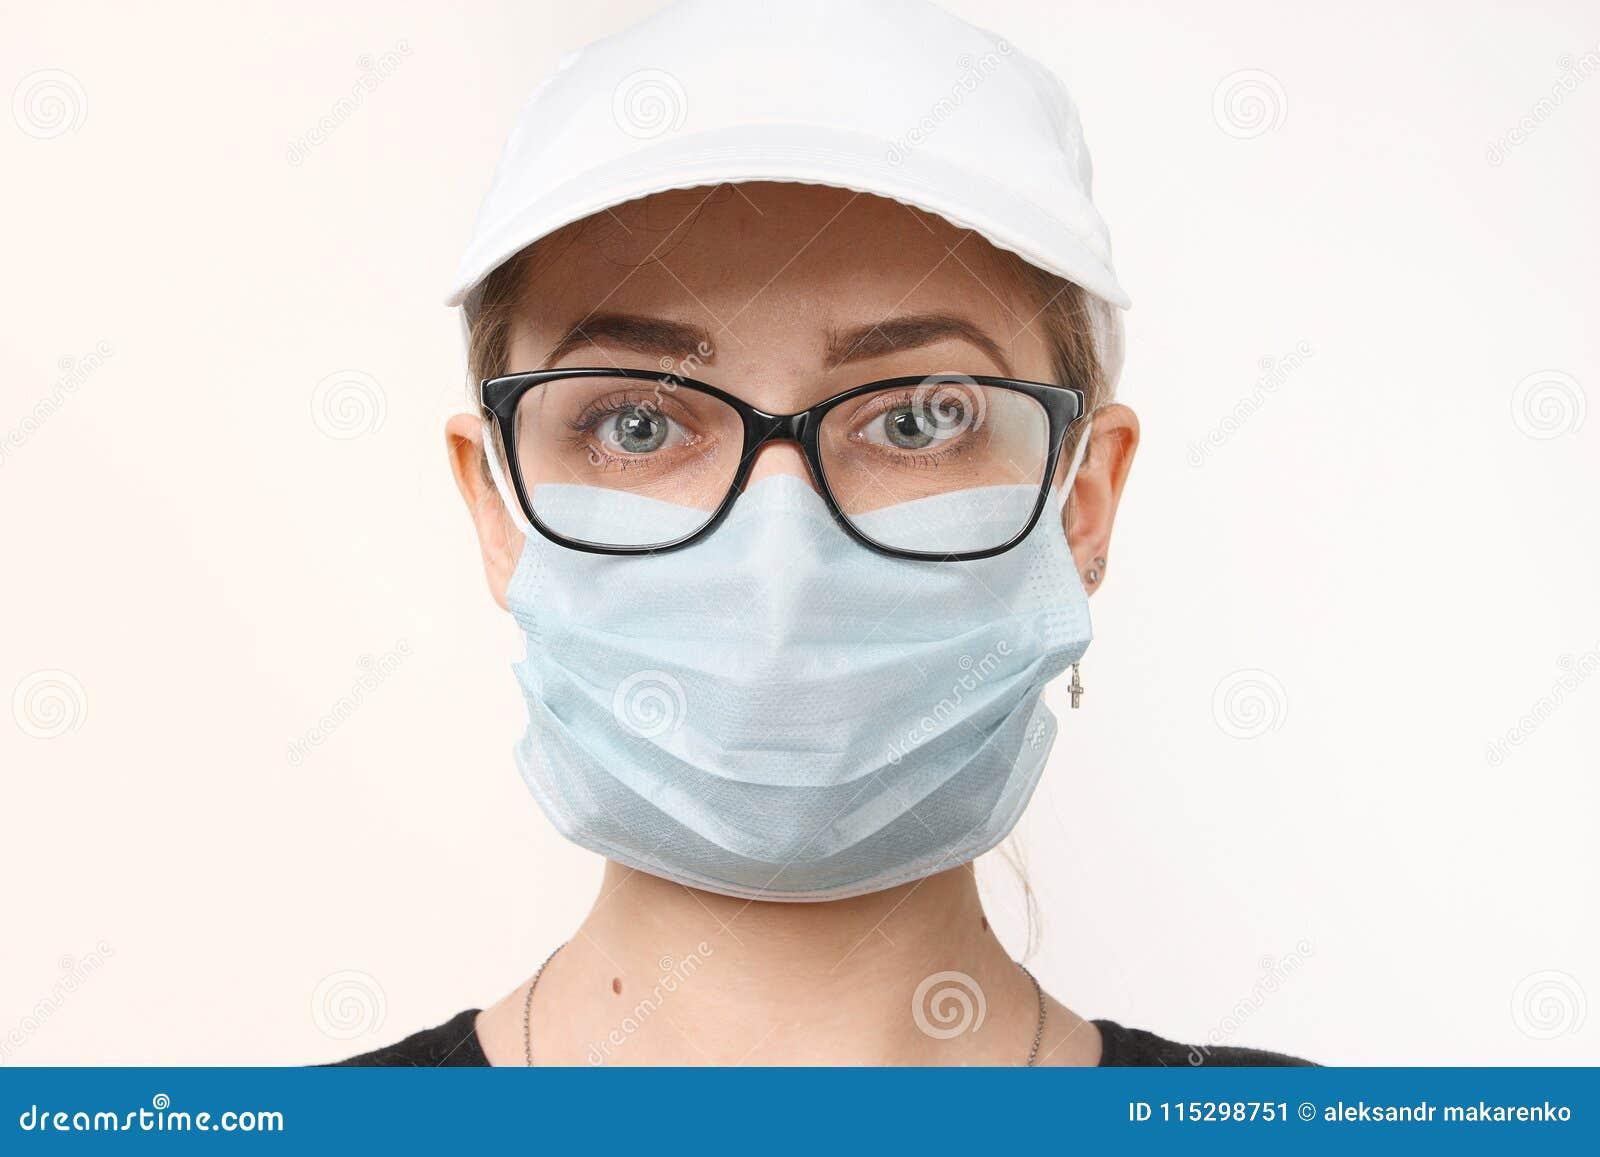 mask respirator medical